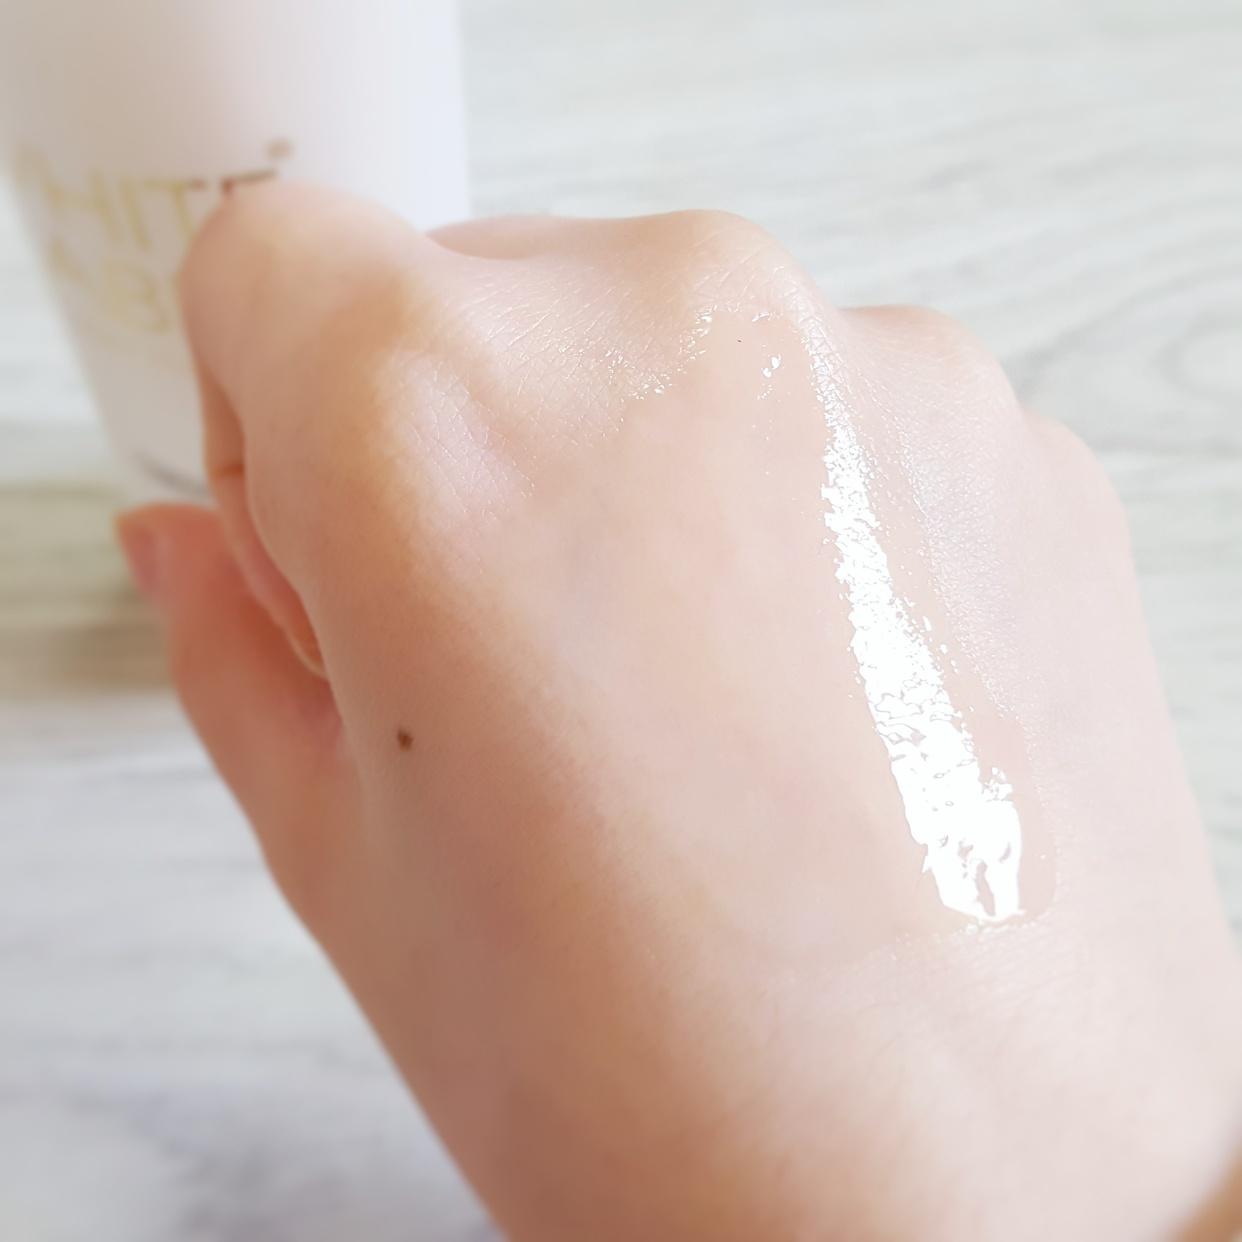 WHITE LABEL+(ホワイトラベルプラス) 薬用プラセンタの美白リフト美容水を使った銀麦さんのクチコミ画像3